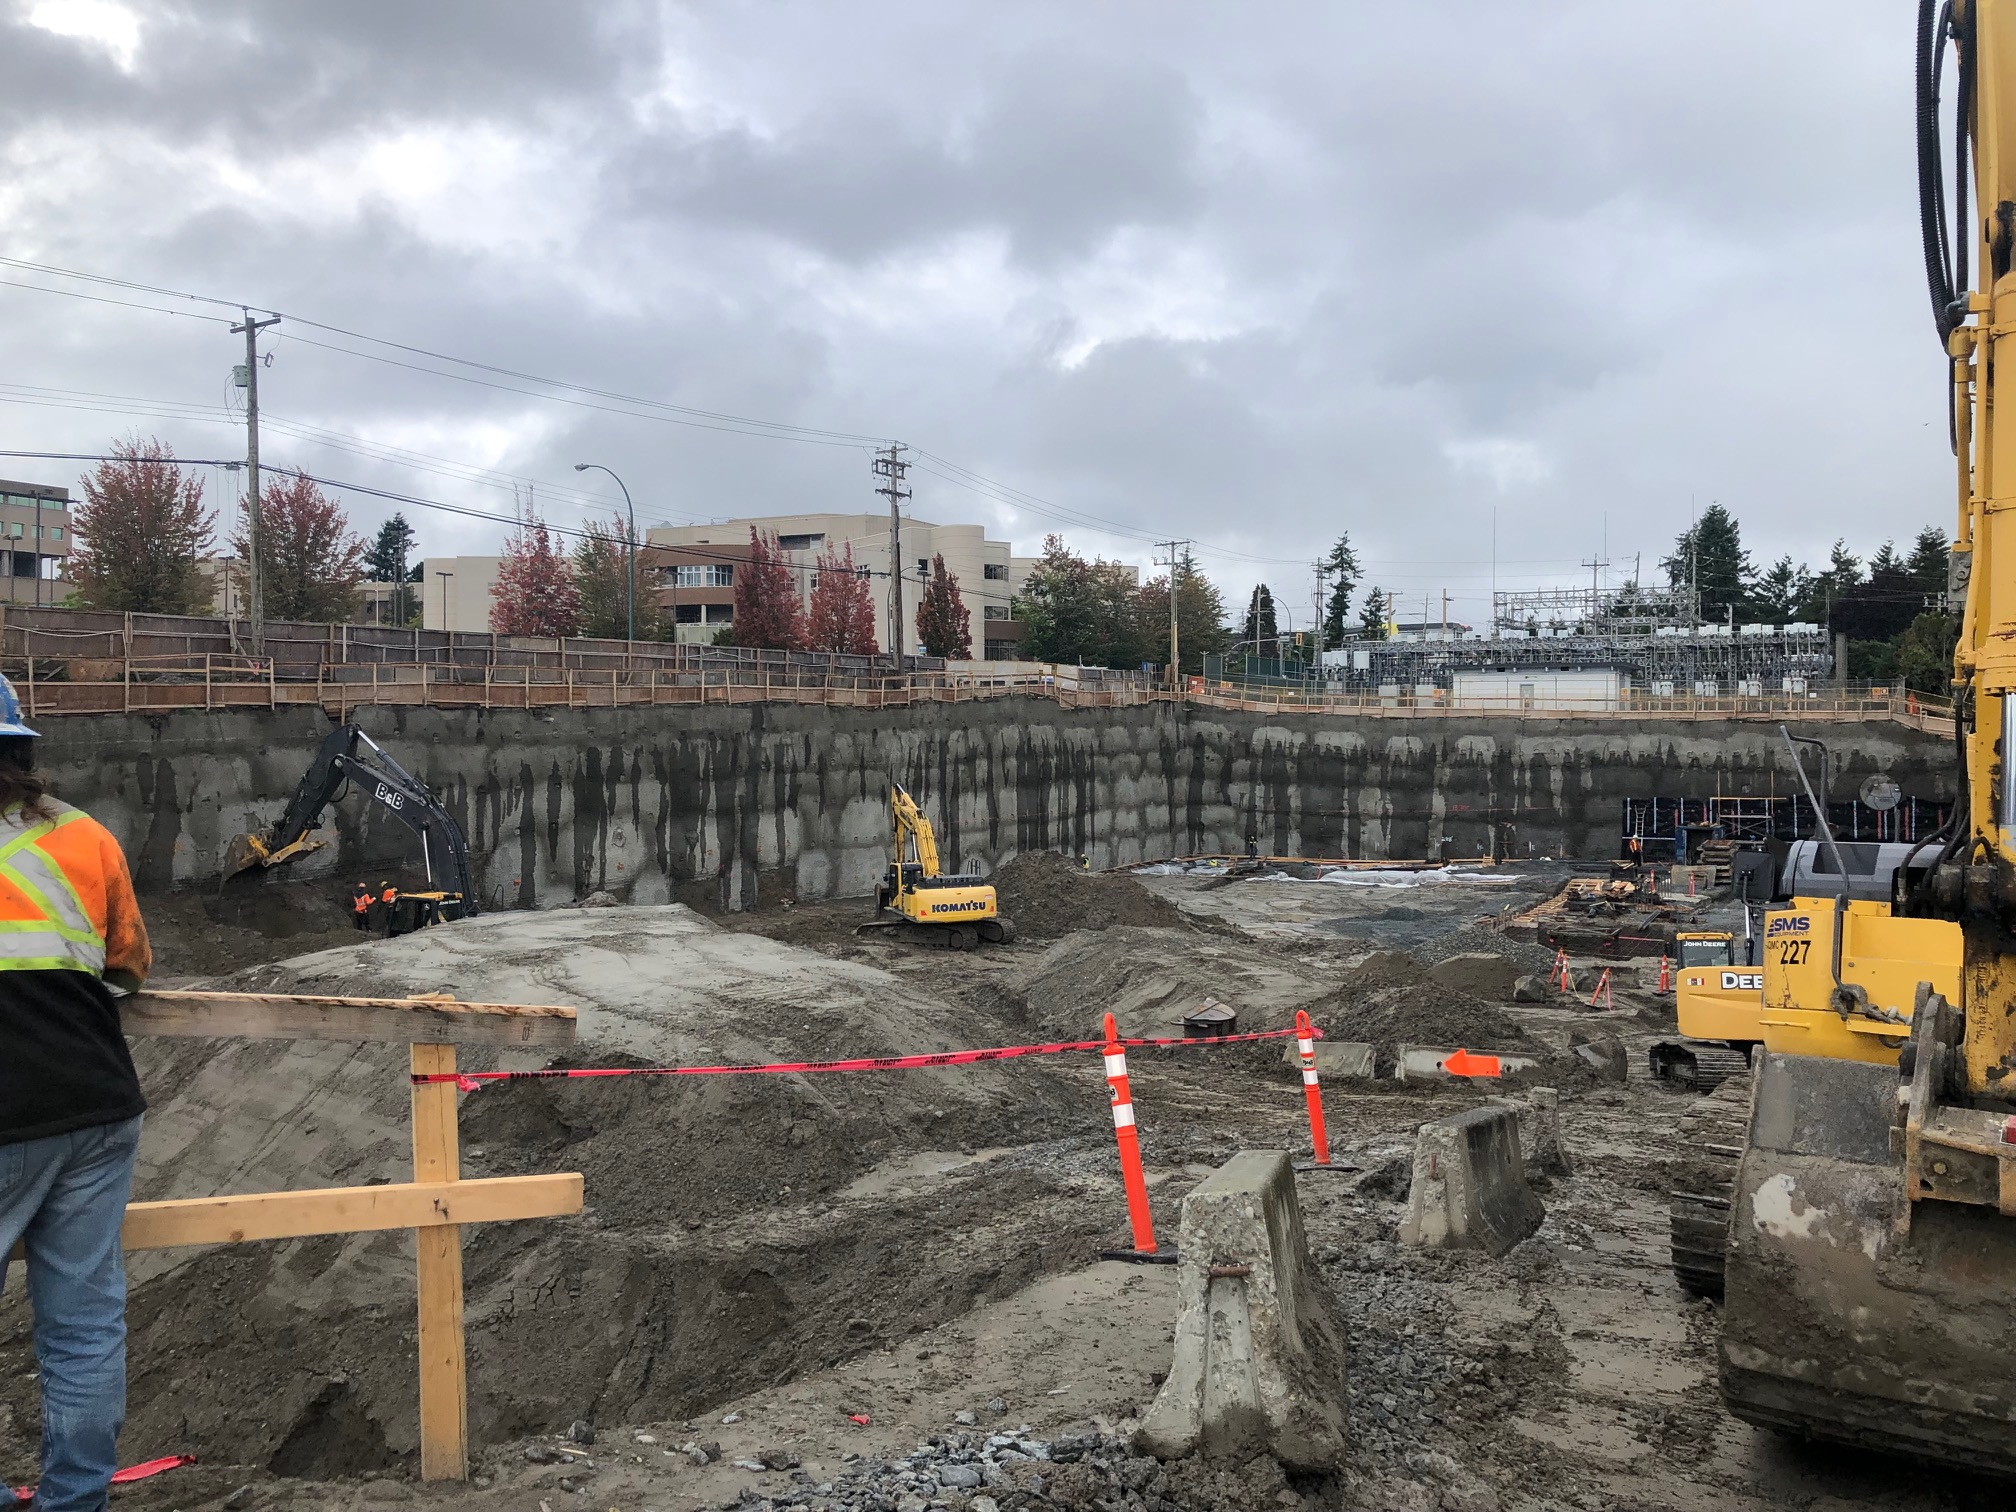 AltusWR_Construction1